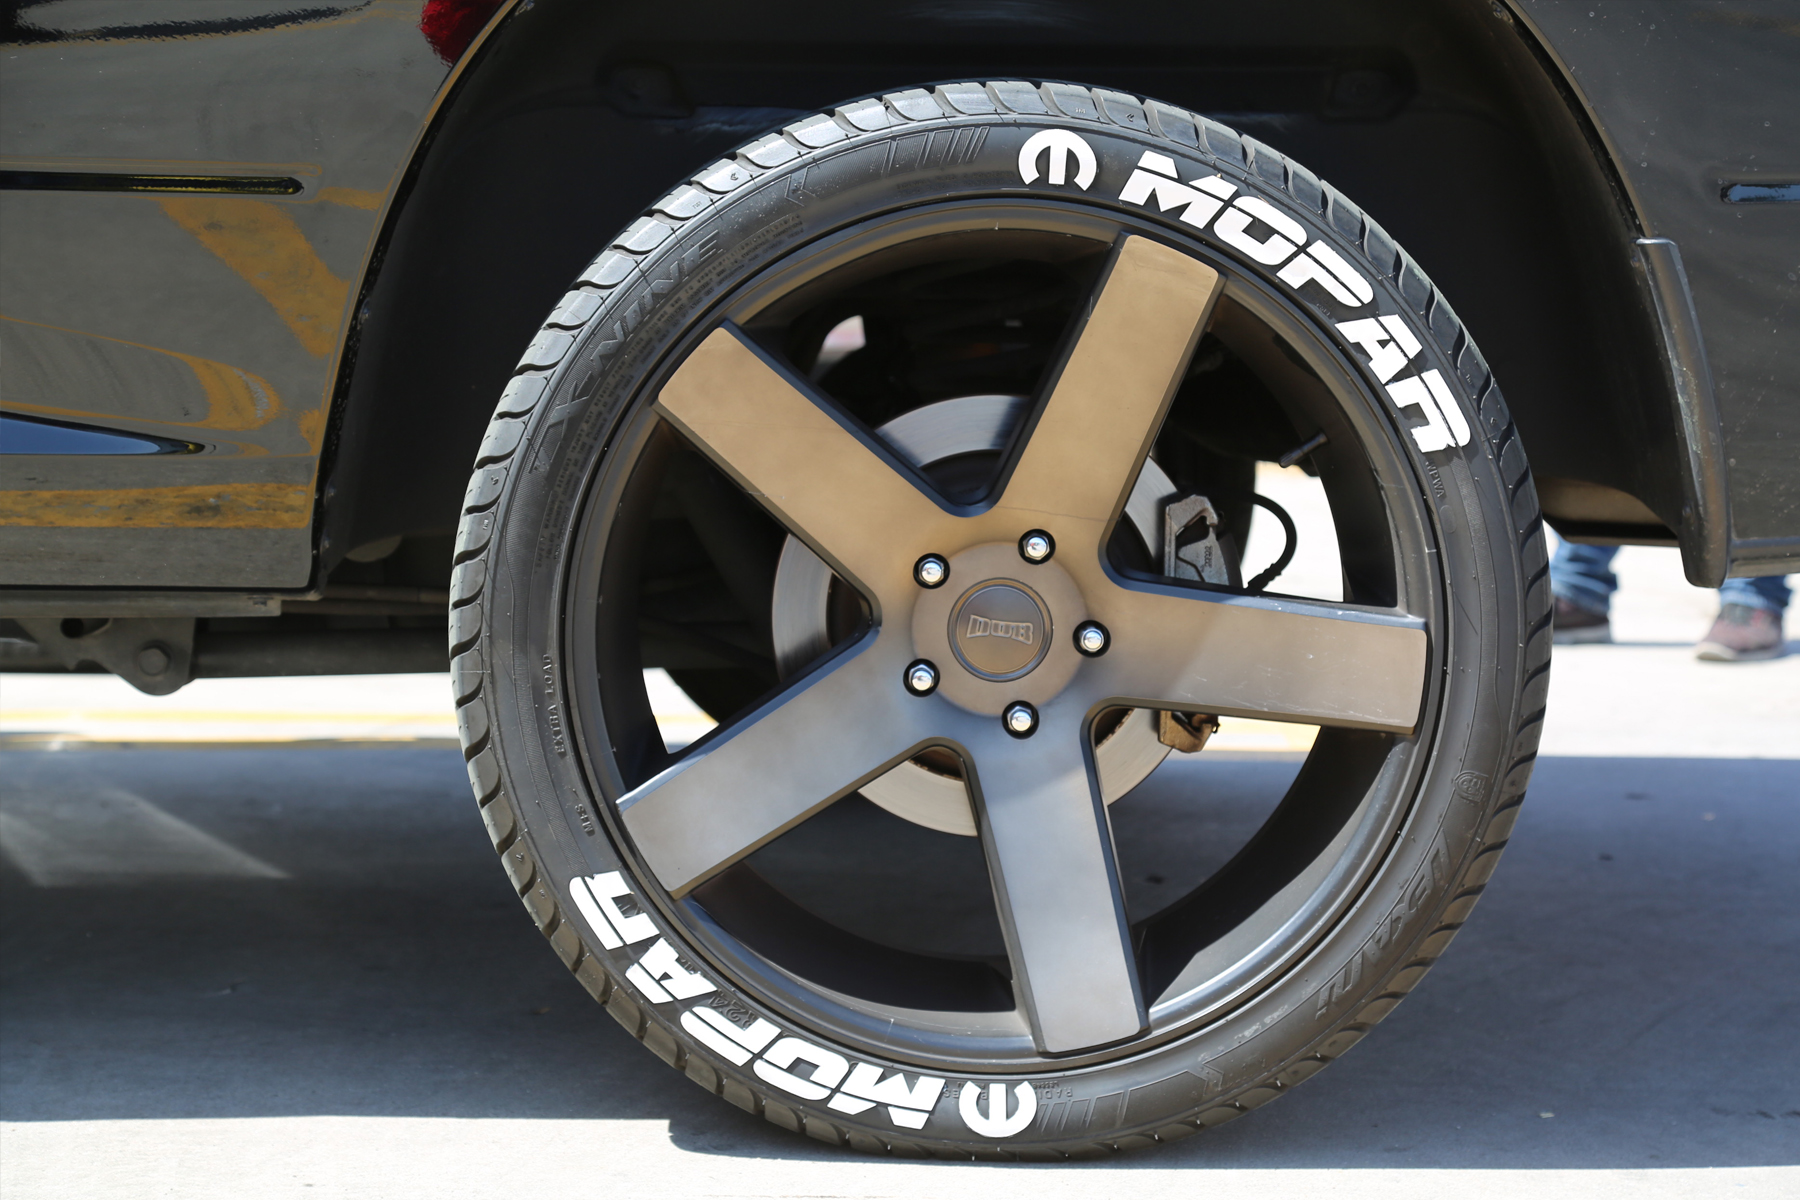 Mopar Tire Sticker Version 1 2 Tire Stickers Com